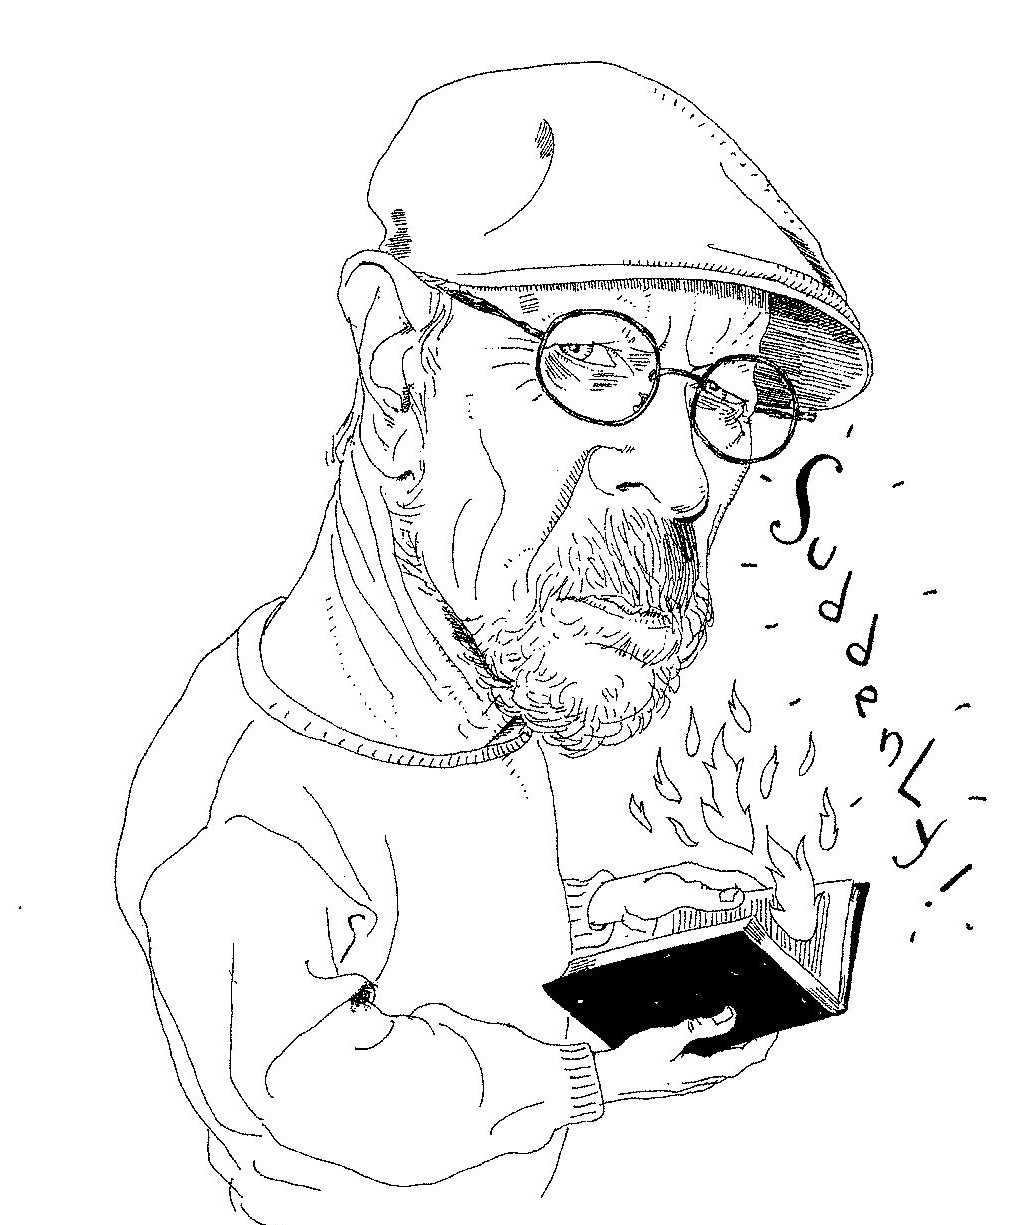 Elmore Leonard's 10 Rules of Writing | Brain Pickings | 1022 x 1225 jpeg 292kB